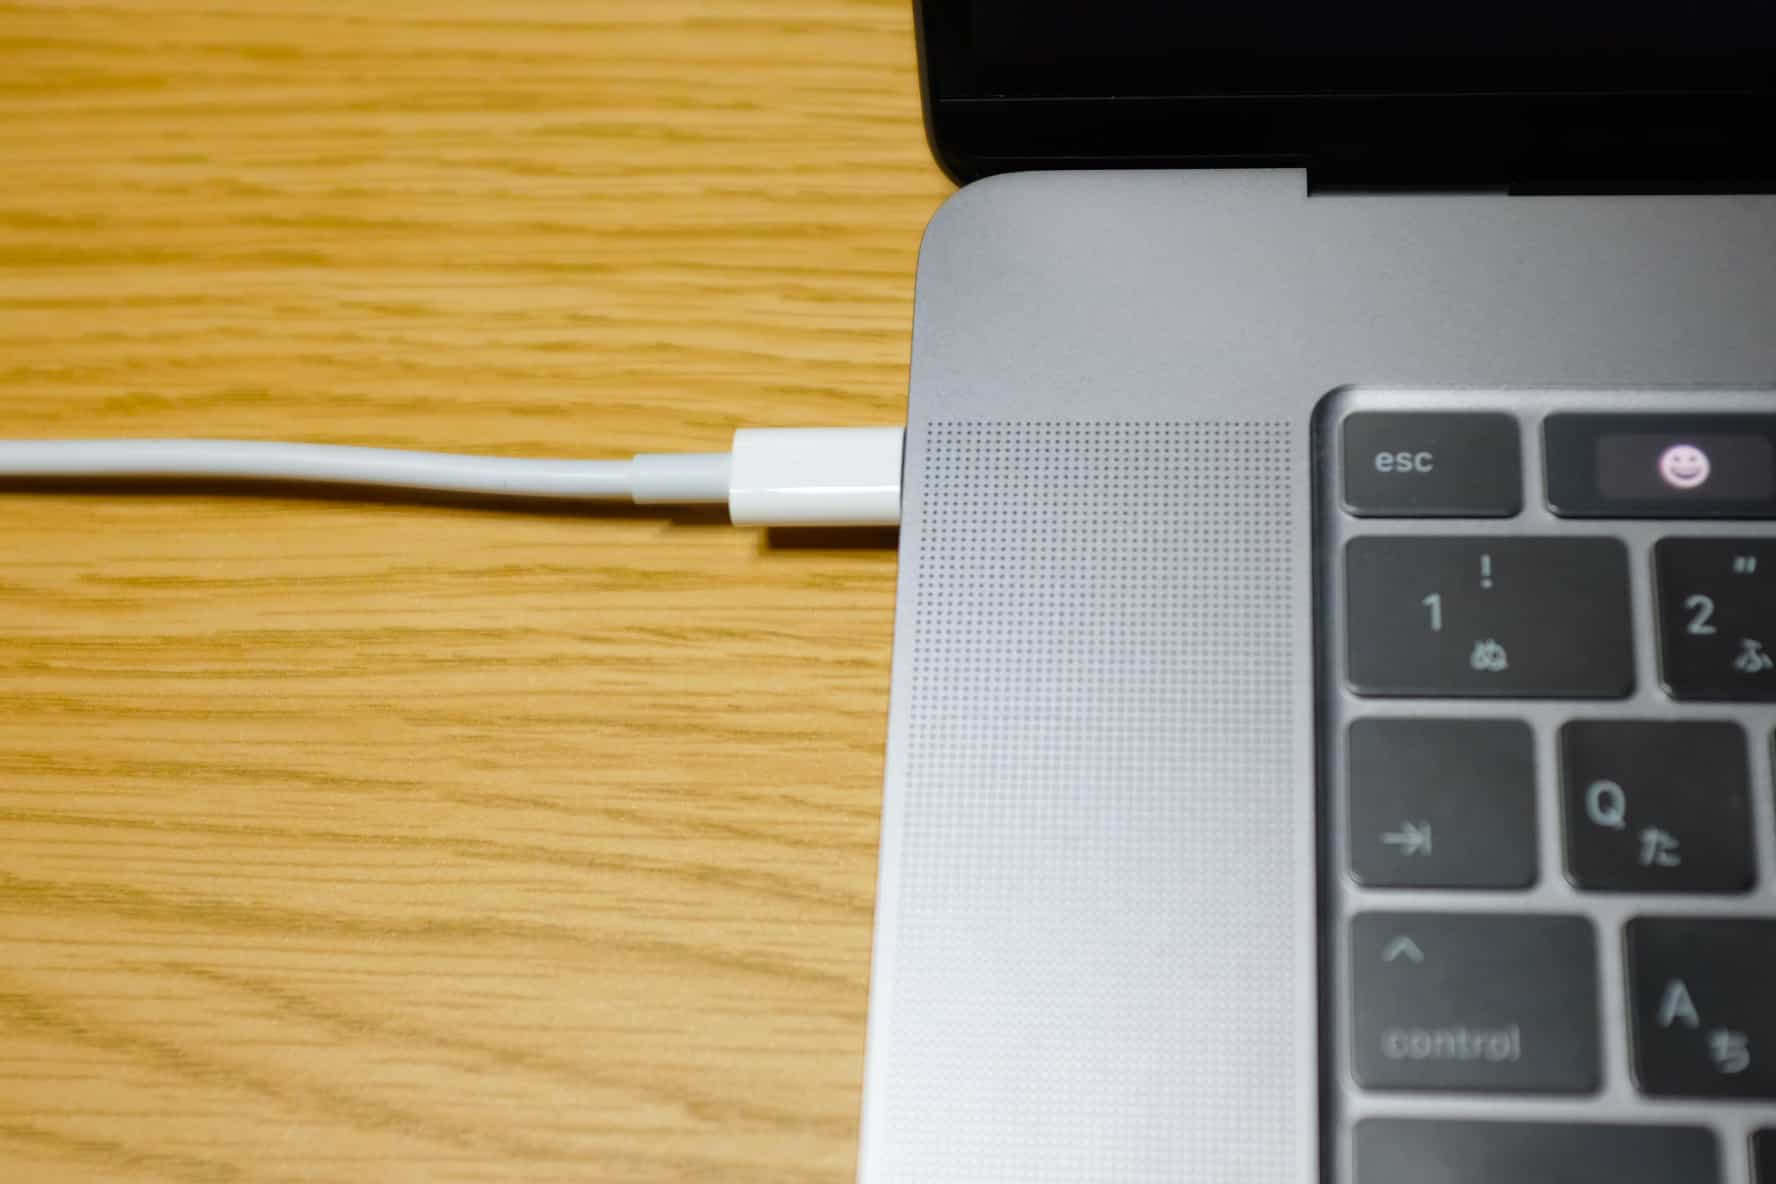 MacBookは充電しながら使う派?充電しながら使わない派??